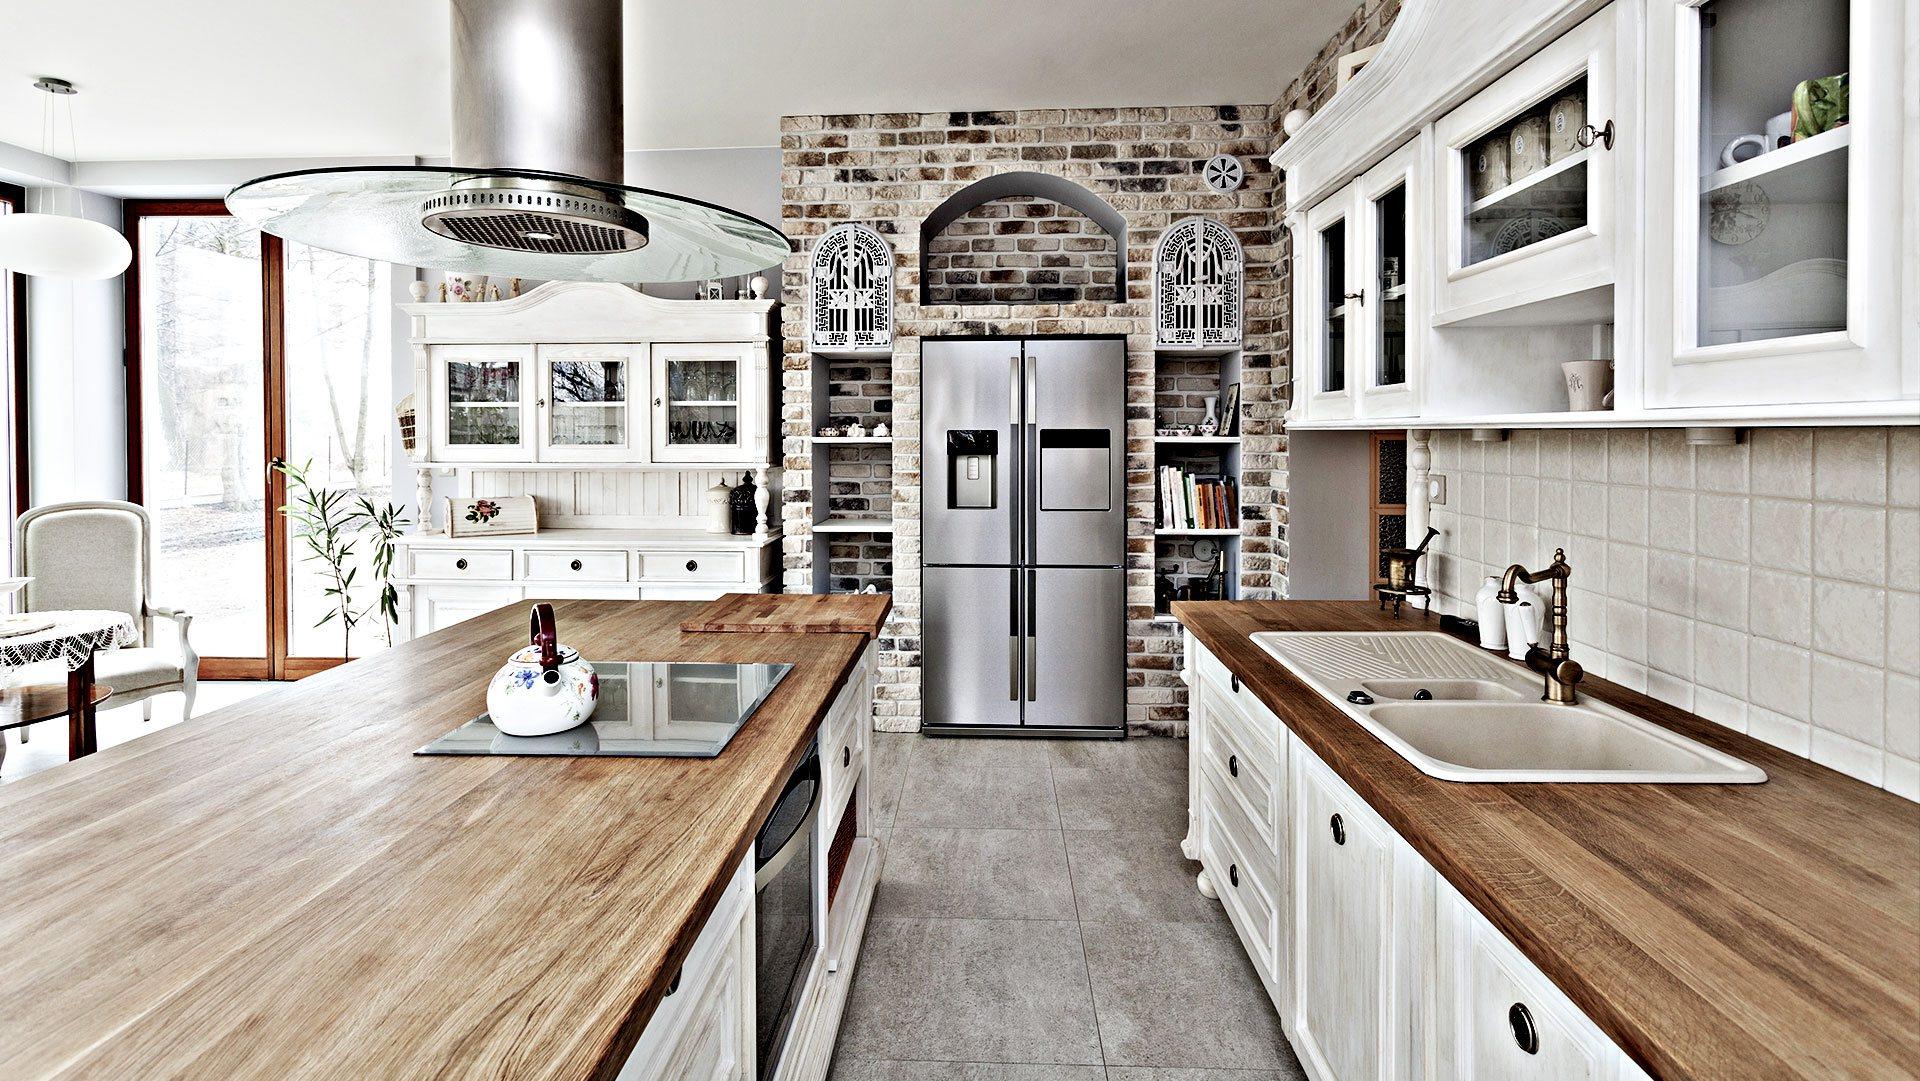 Epic Home Improvements Inc. Remodeled Kitchen 1